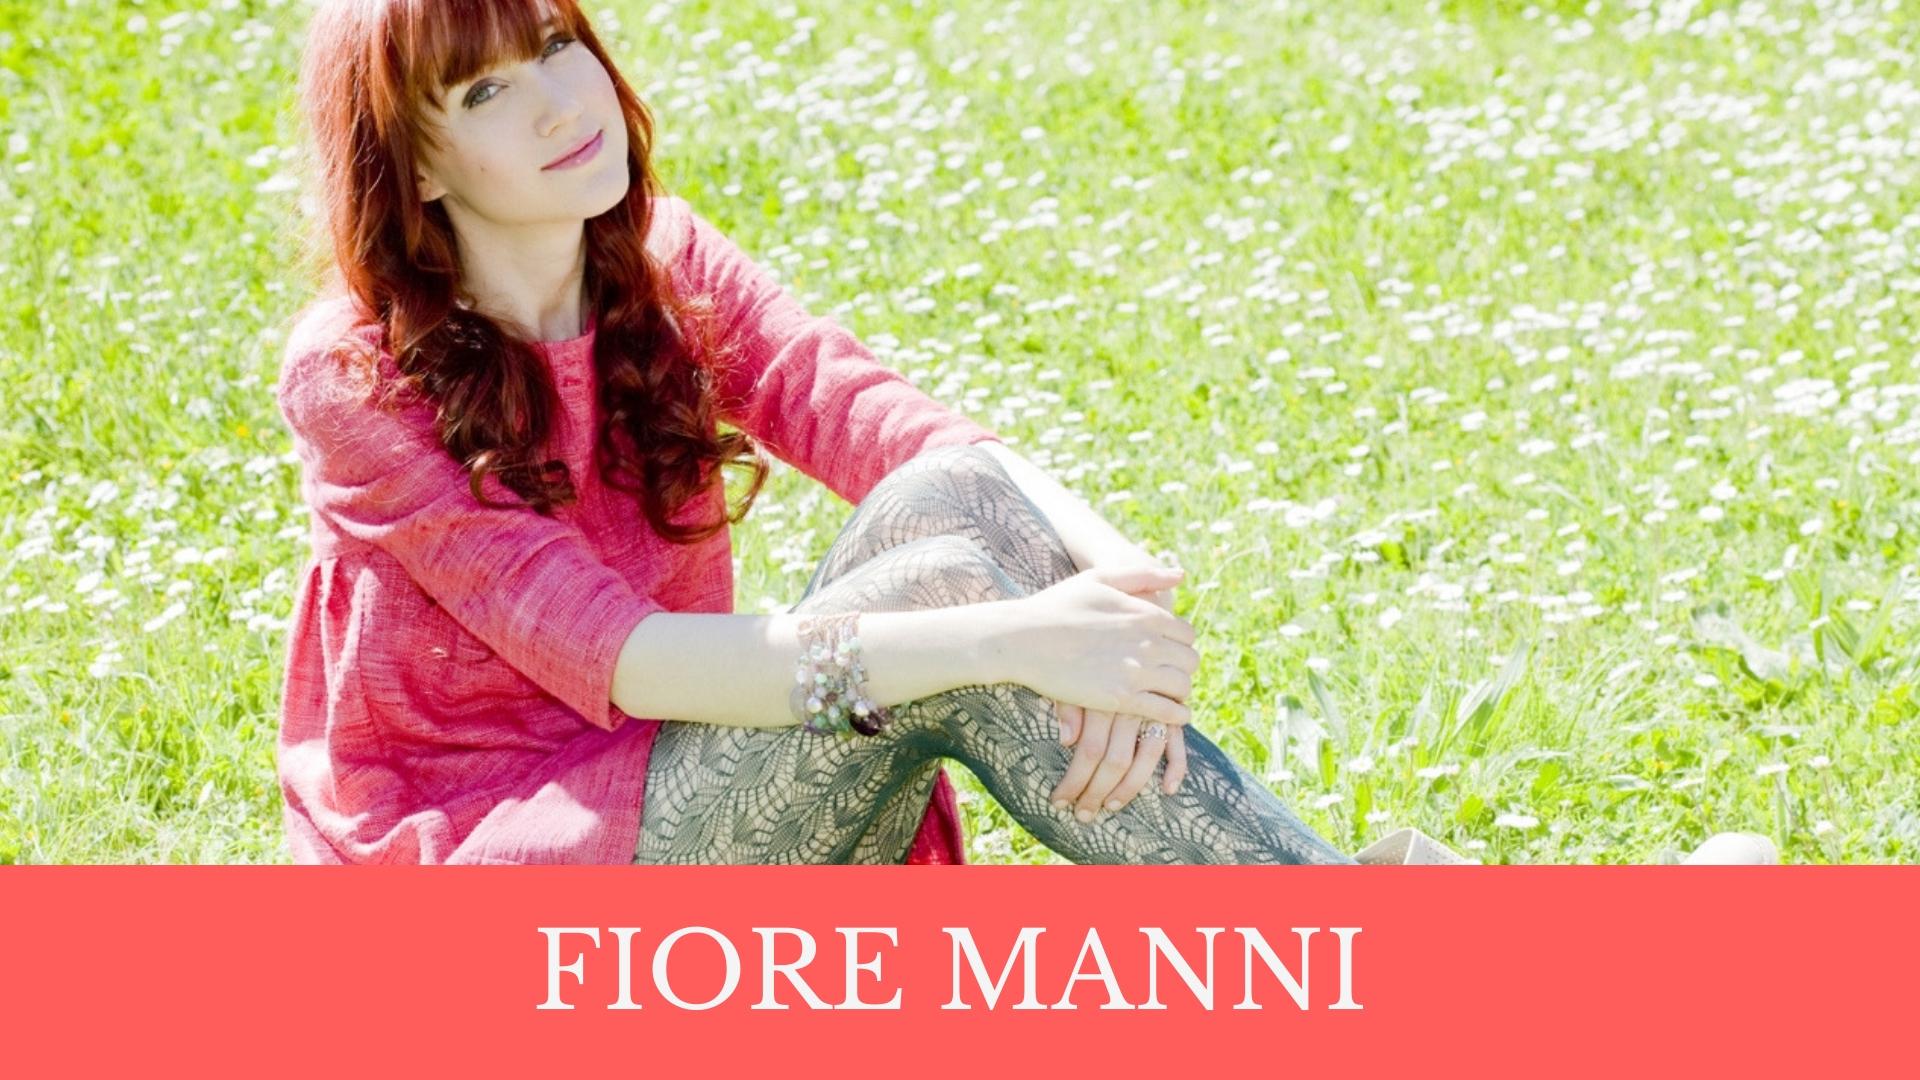 Fiore Manni